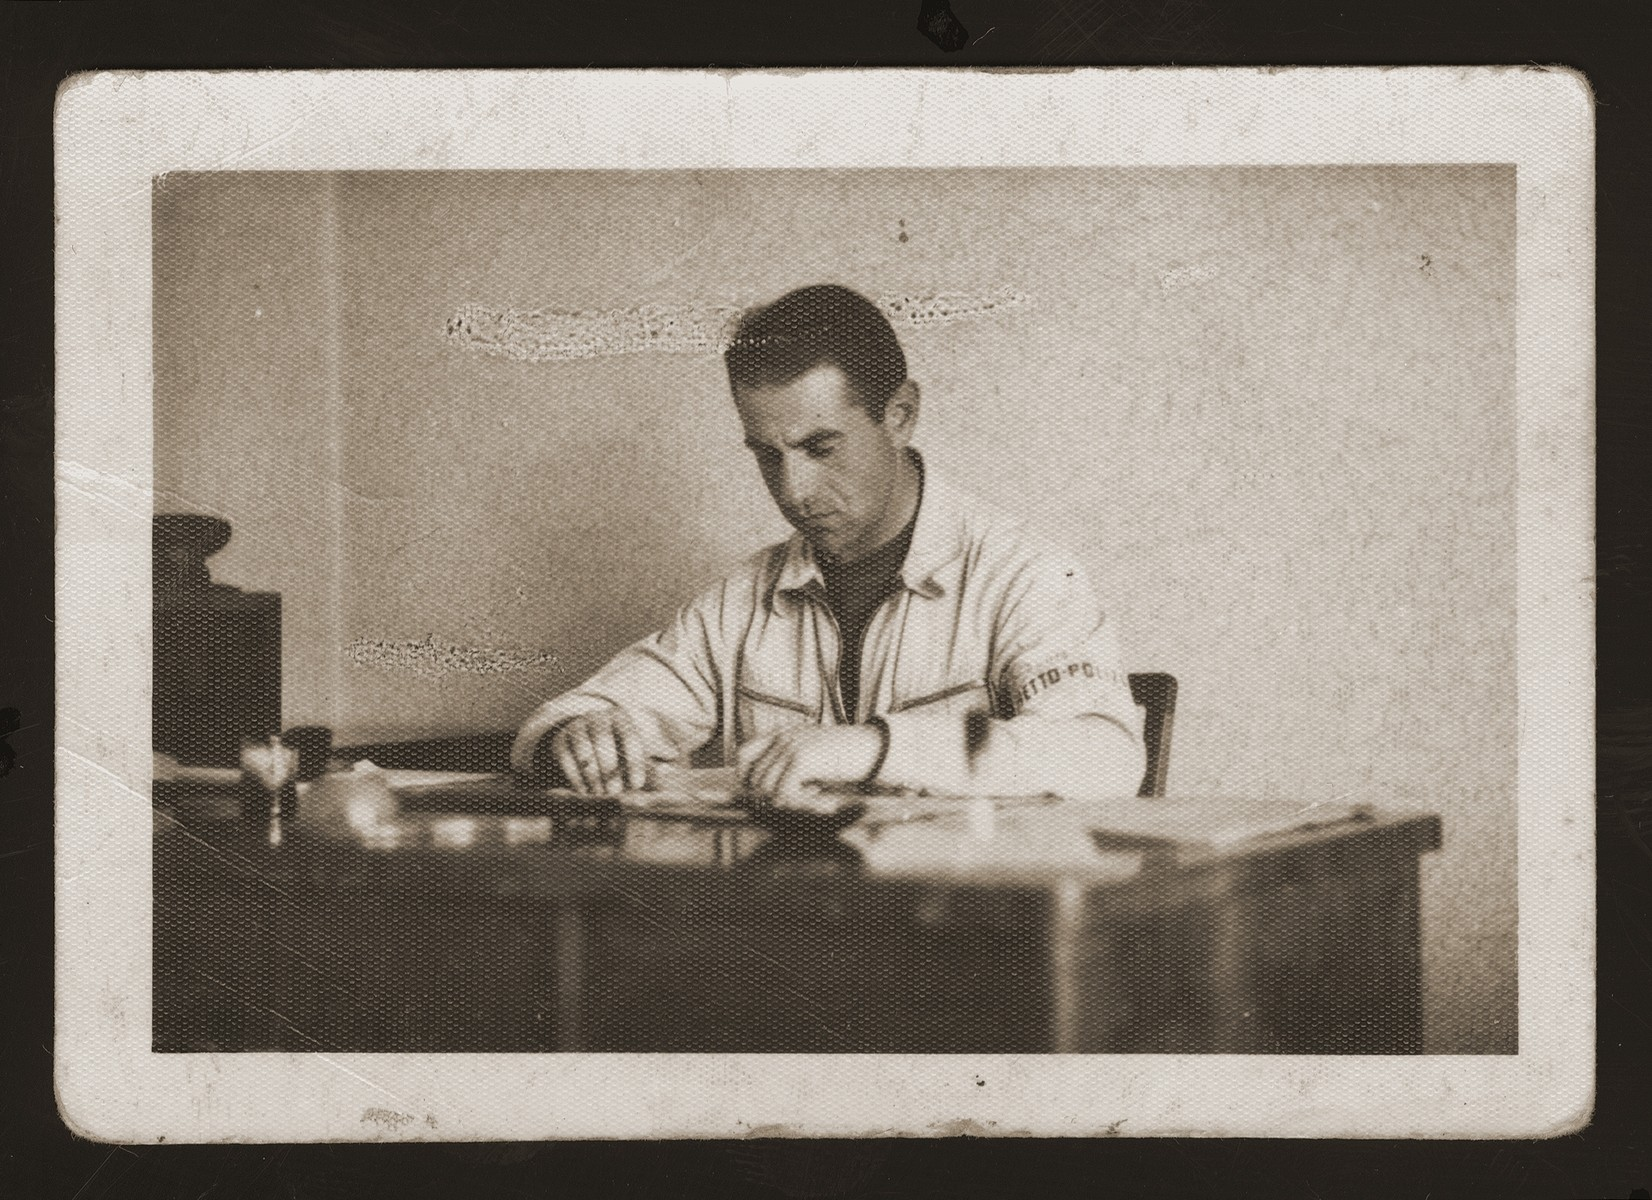 Deputy Police Chief Yehuda Zupovitz at his desk in the Kovno ghetto.